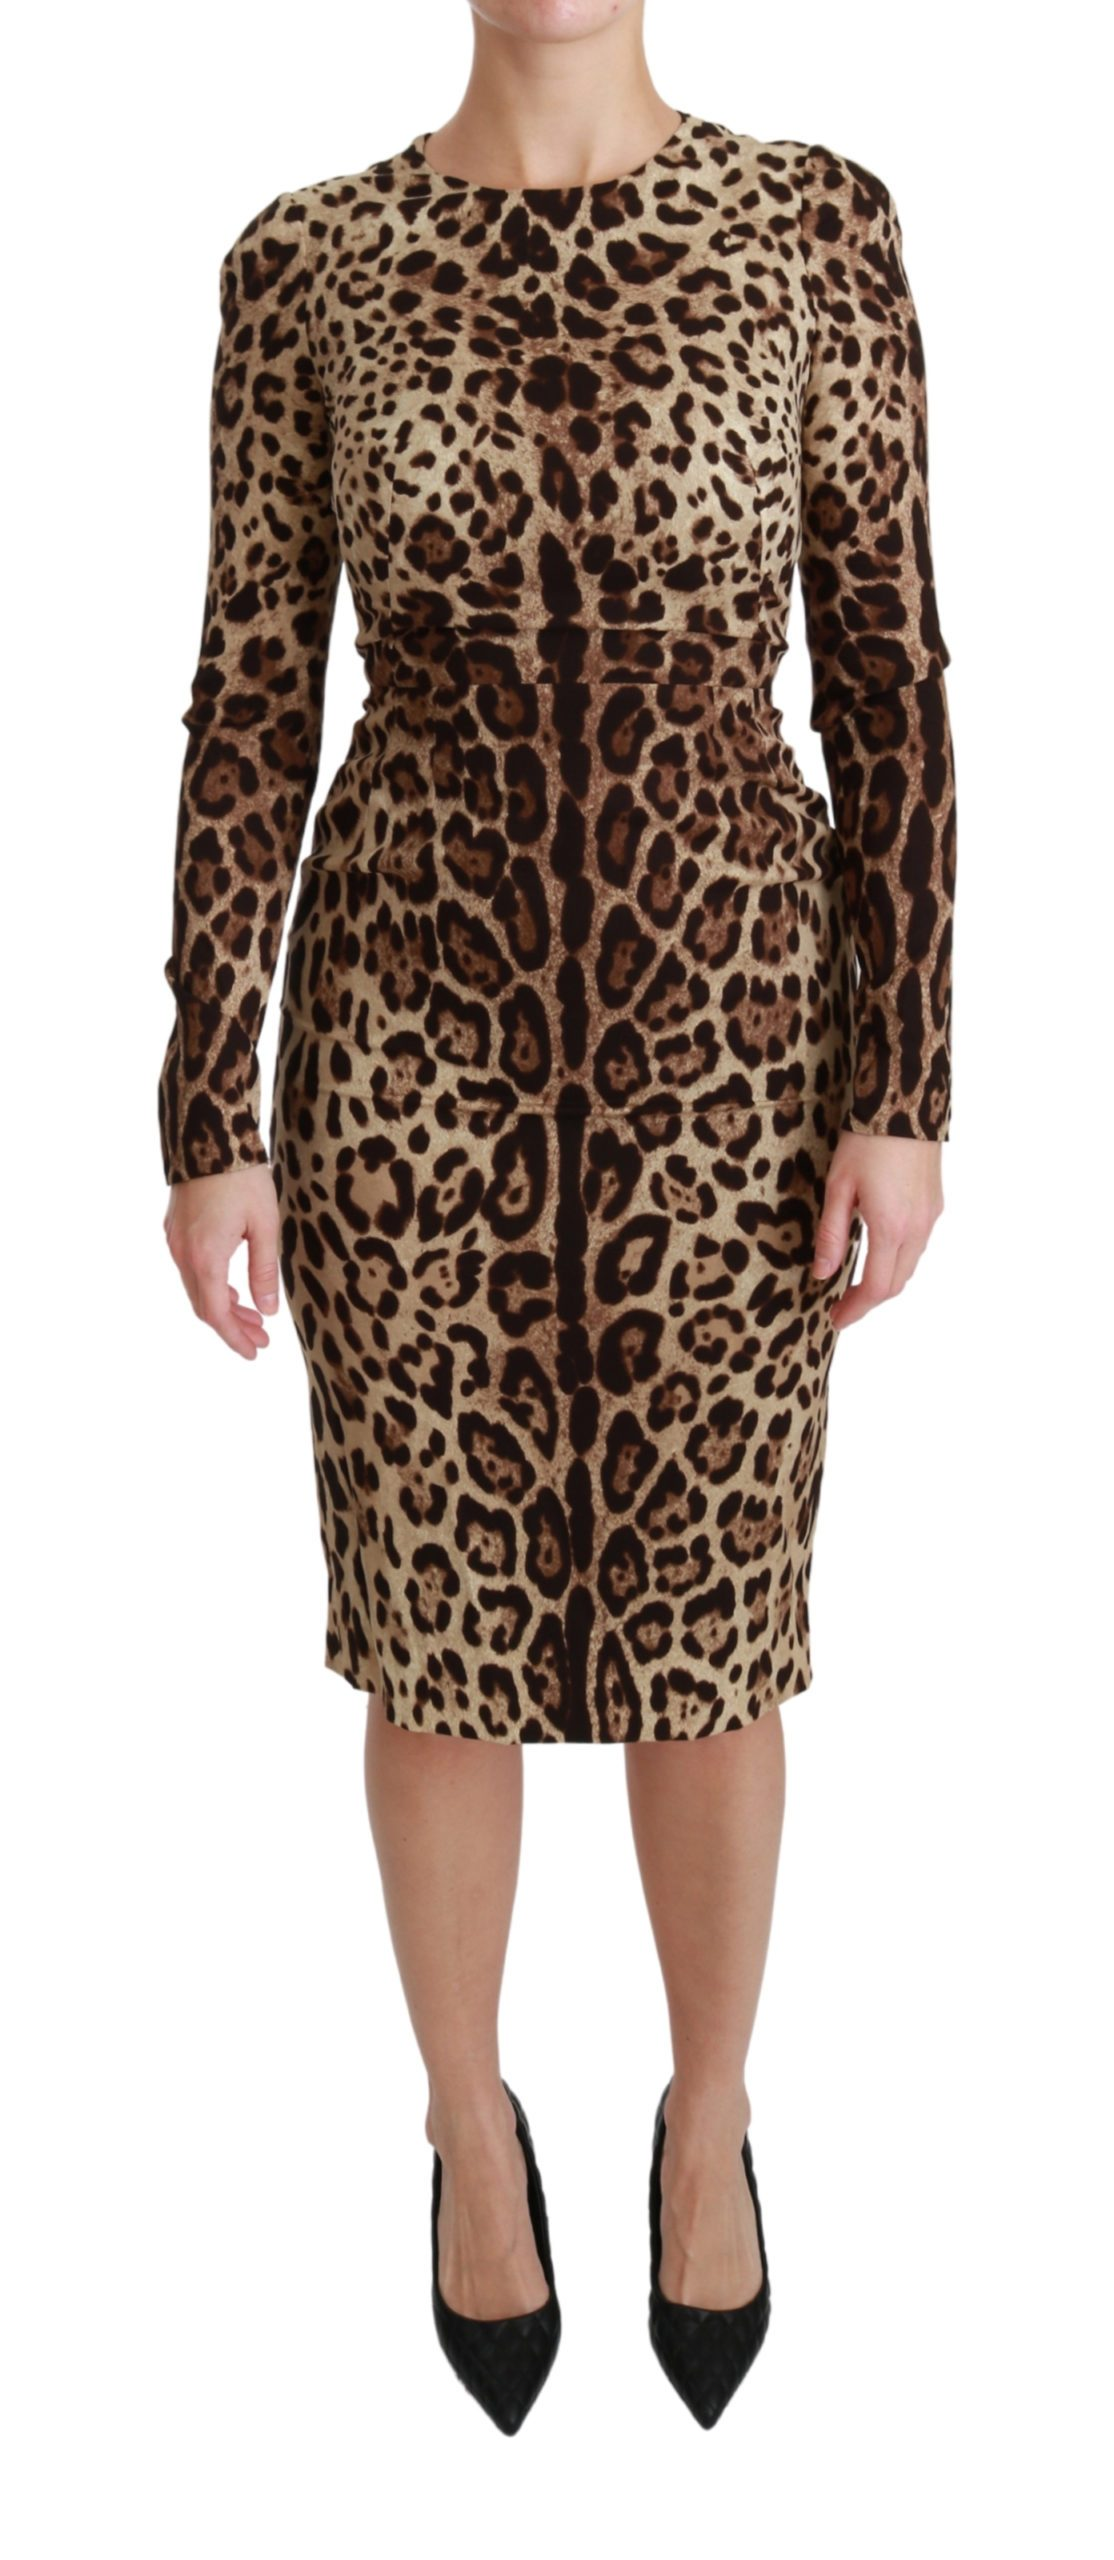 Dolce & Gabbana Women's Leopard Bodycon Silk Dress Brown DR2472 - IT38|XS